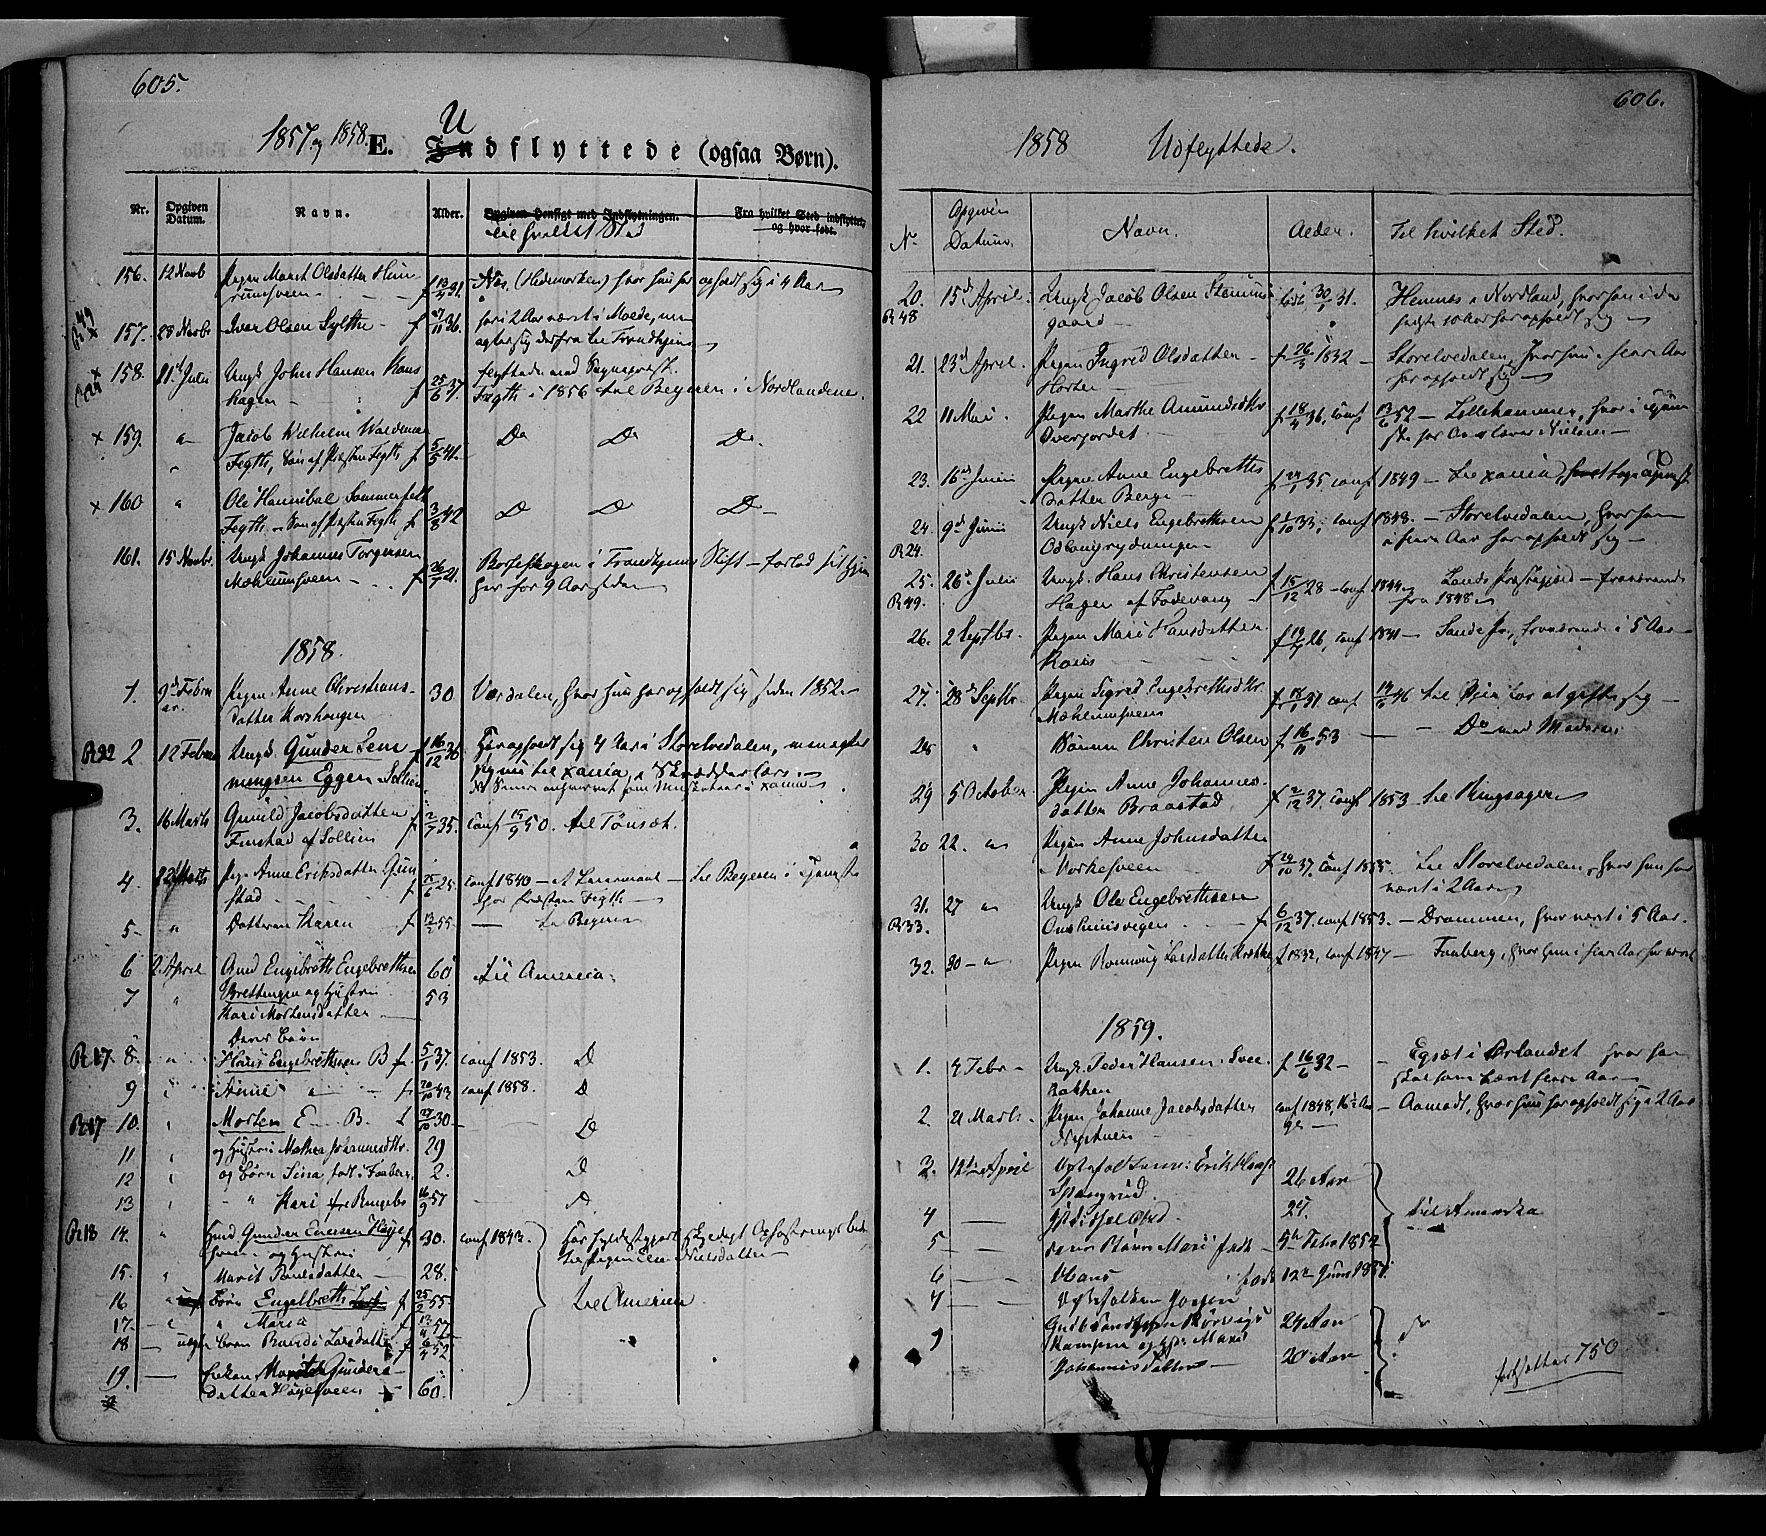 SAH, Ringebu prestekontor, Ministerialbok nr. 6, 1848-1859, s. 605-606